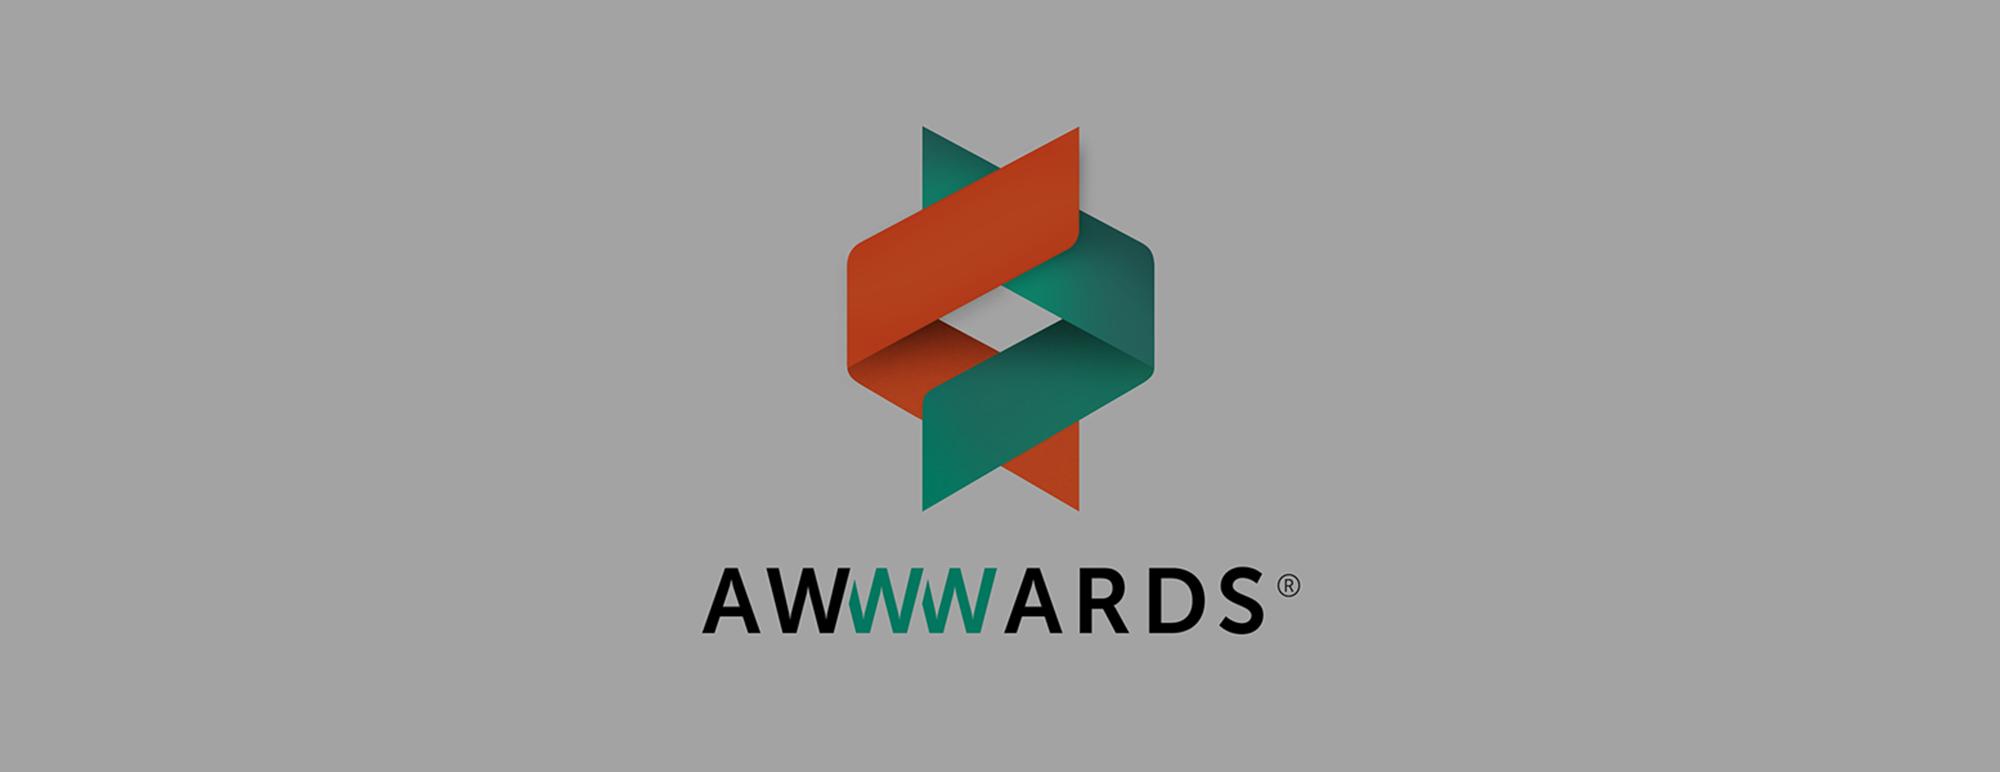 CasaSoft Web Design Malta featured on Awwwards